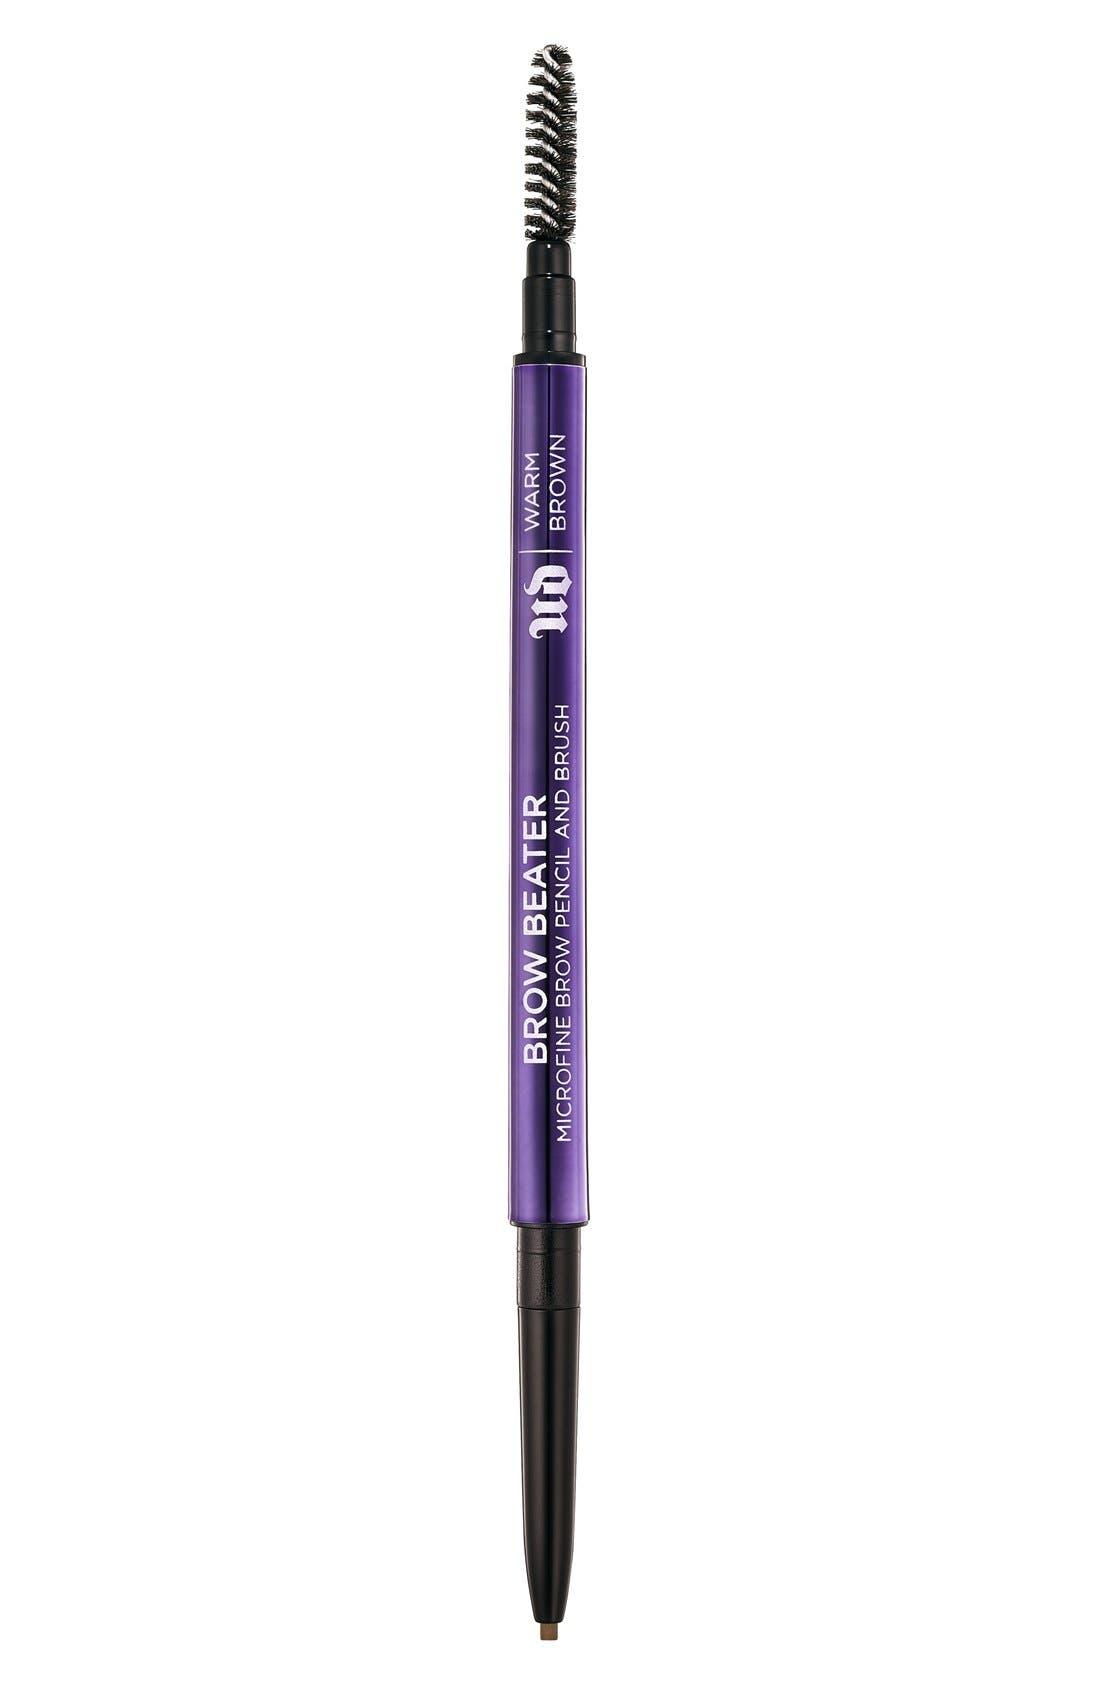 Image of Urban Decay Brow Beater Microfine Brow Pencil & Brush - Warm Brown